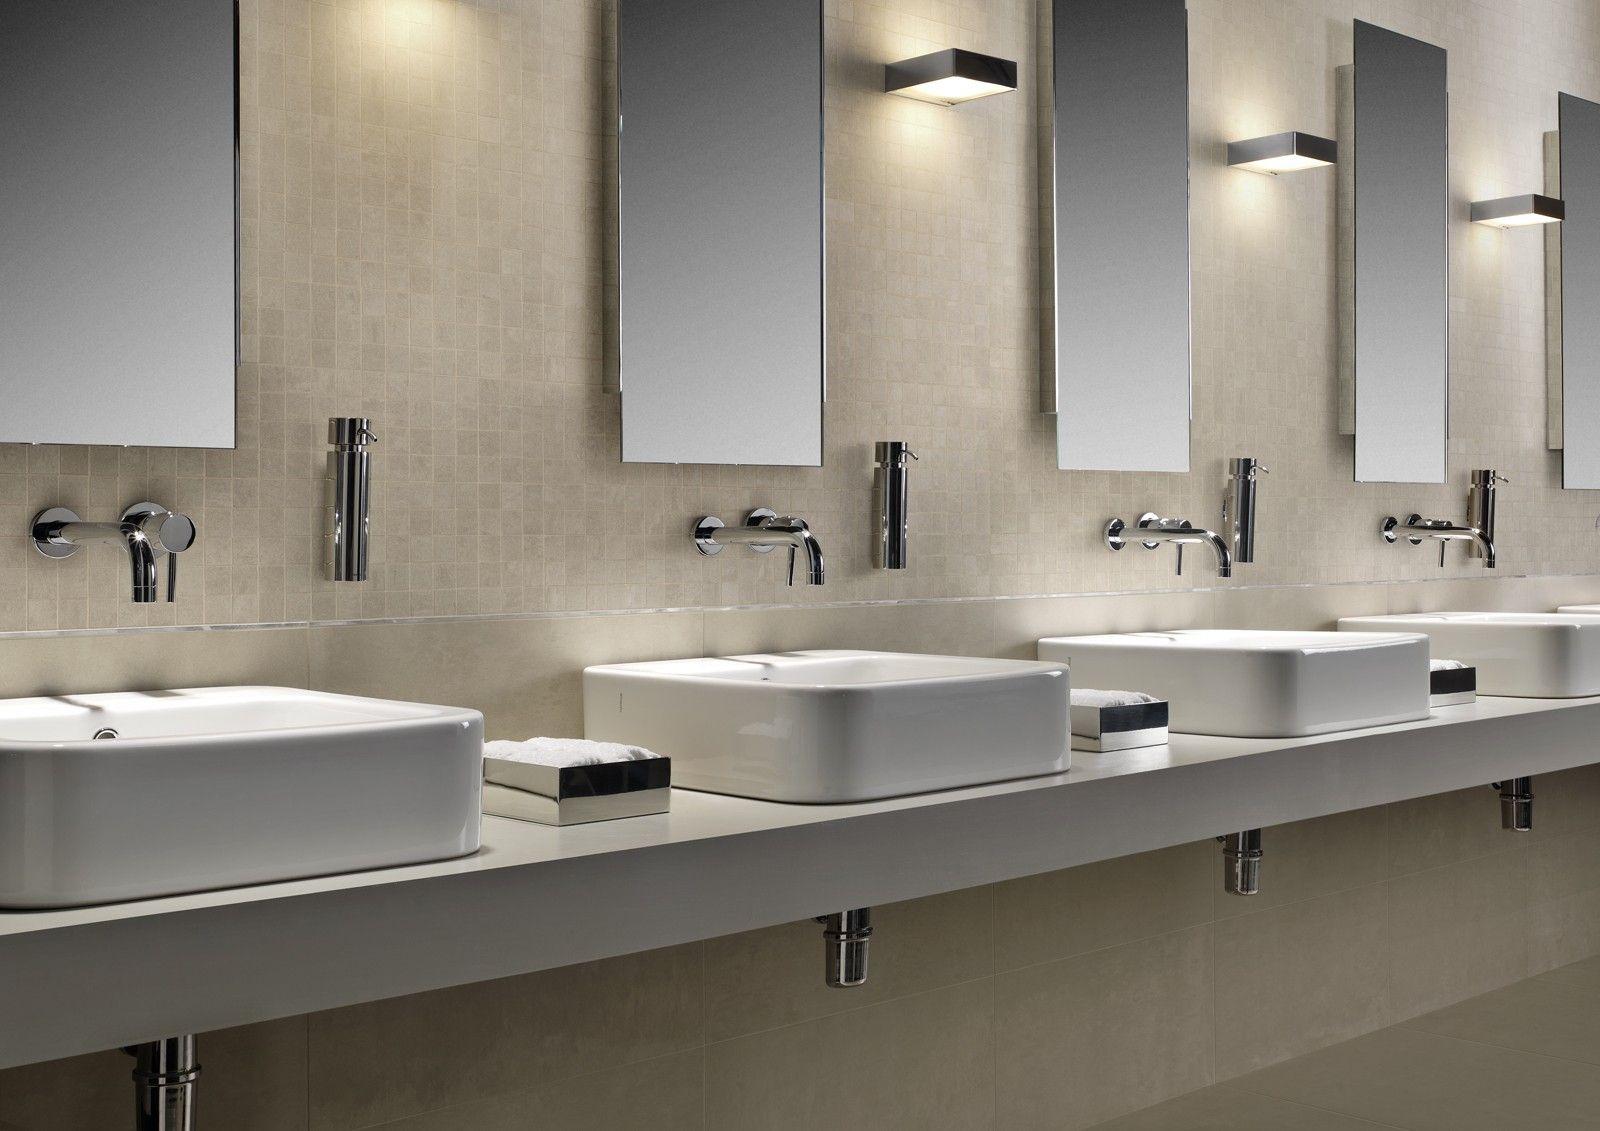 Carrelage Moderne Texture Impressionnant Stock Marazzi Systemn Neutro Sabbia Textured 15x60 Cm M84l